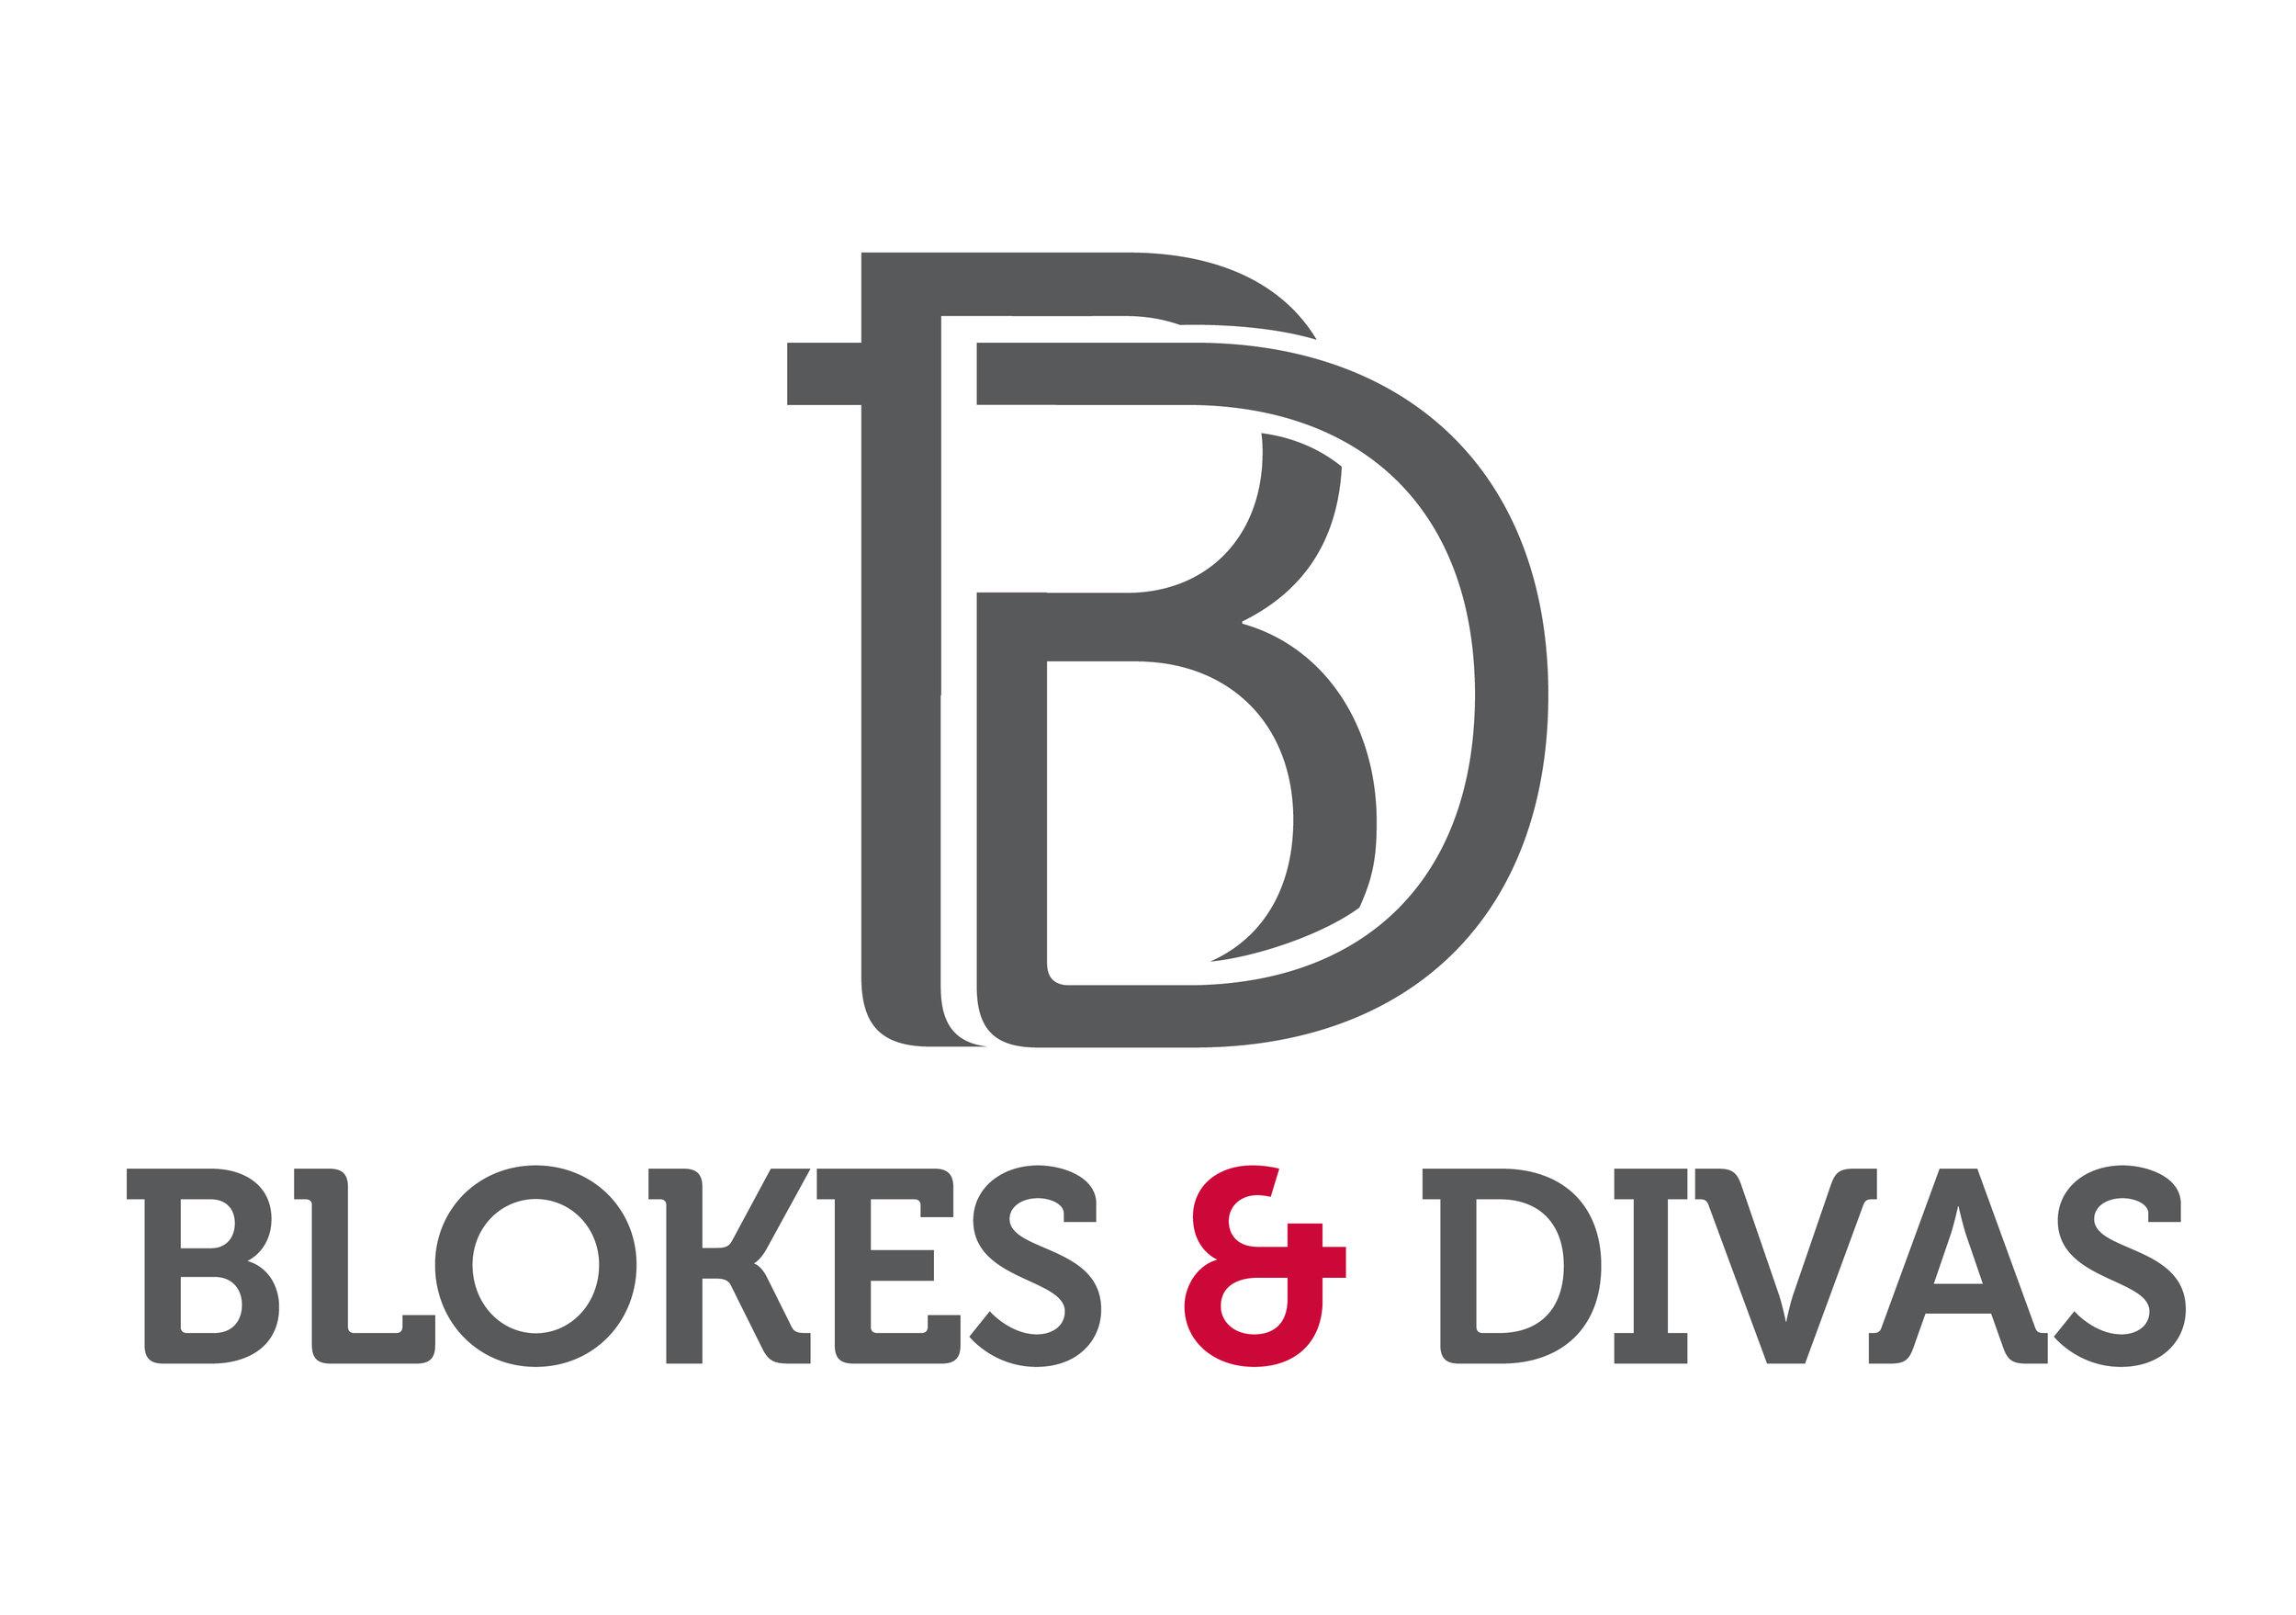 Blokes & Divas-TEXT.jpg